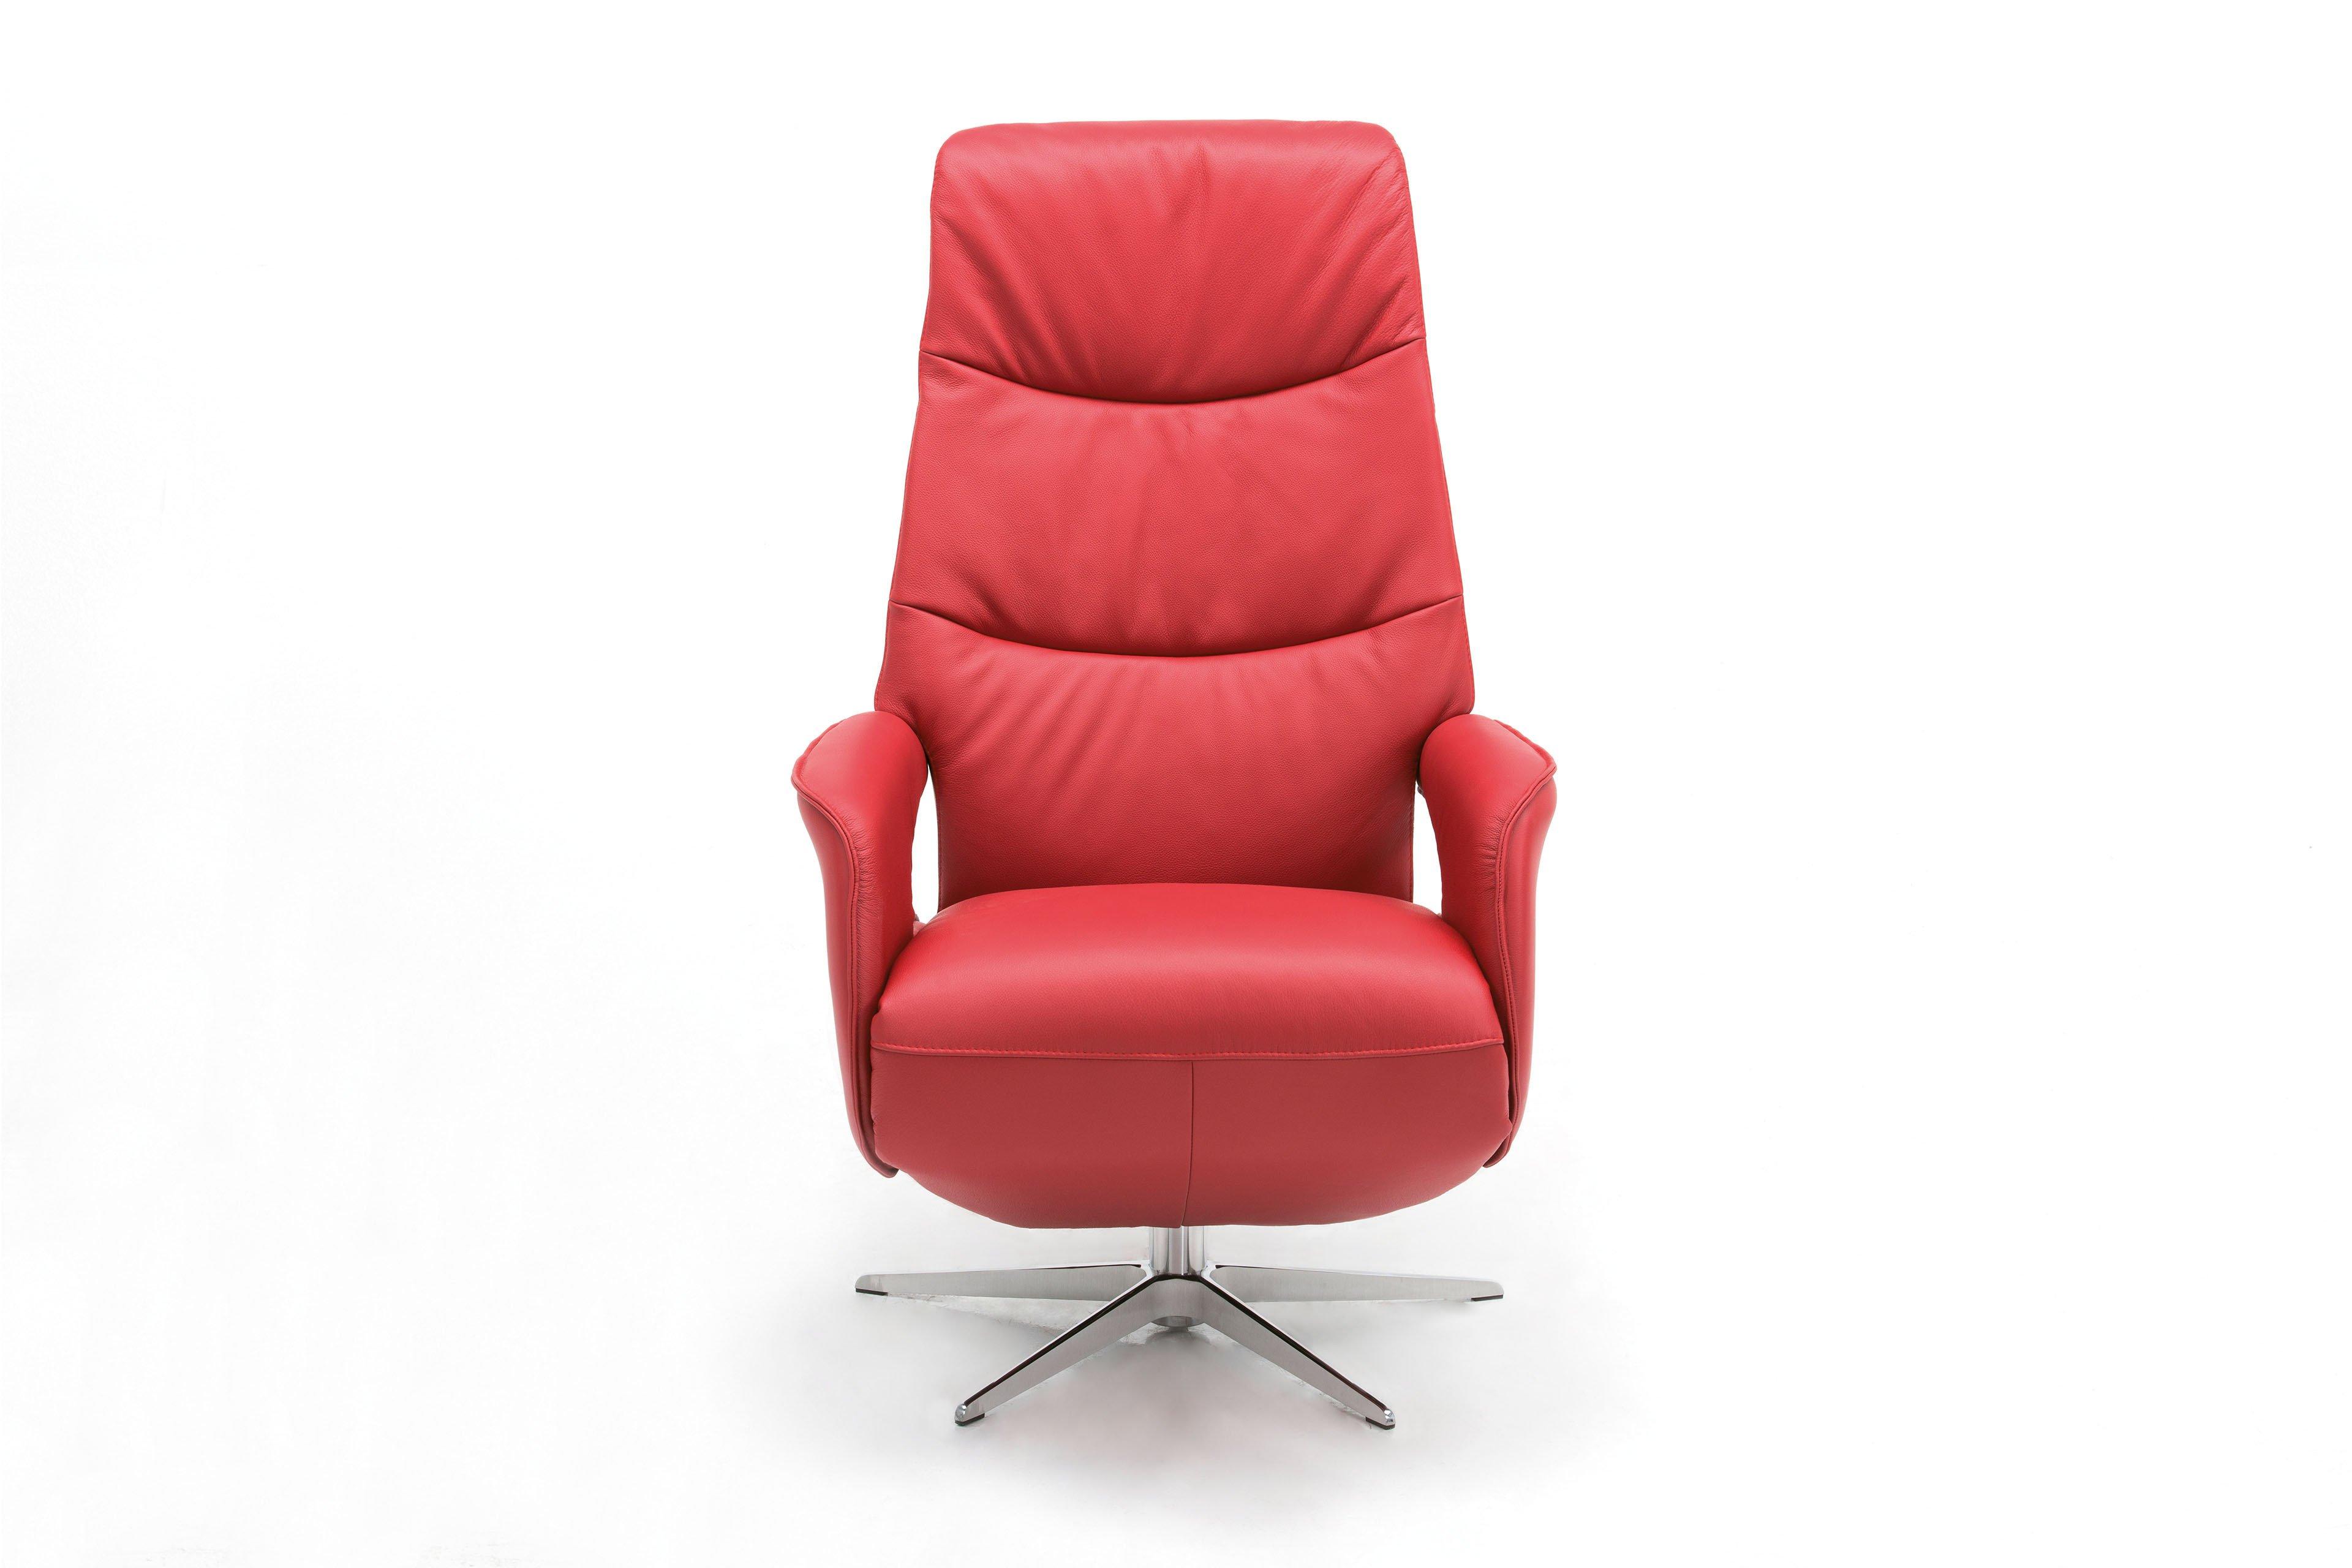 skandinavische m bel aaltje funktionssessel in rot m bel. Black Bedroom Furniture Sets. Home Design Ideas